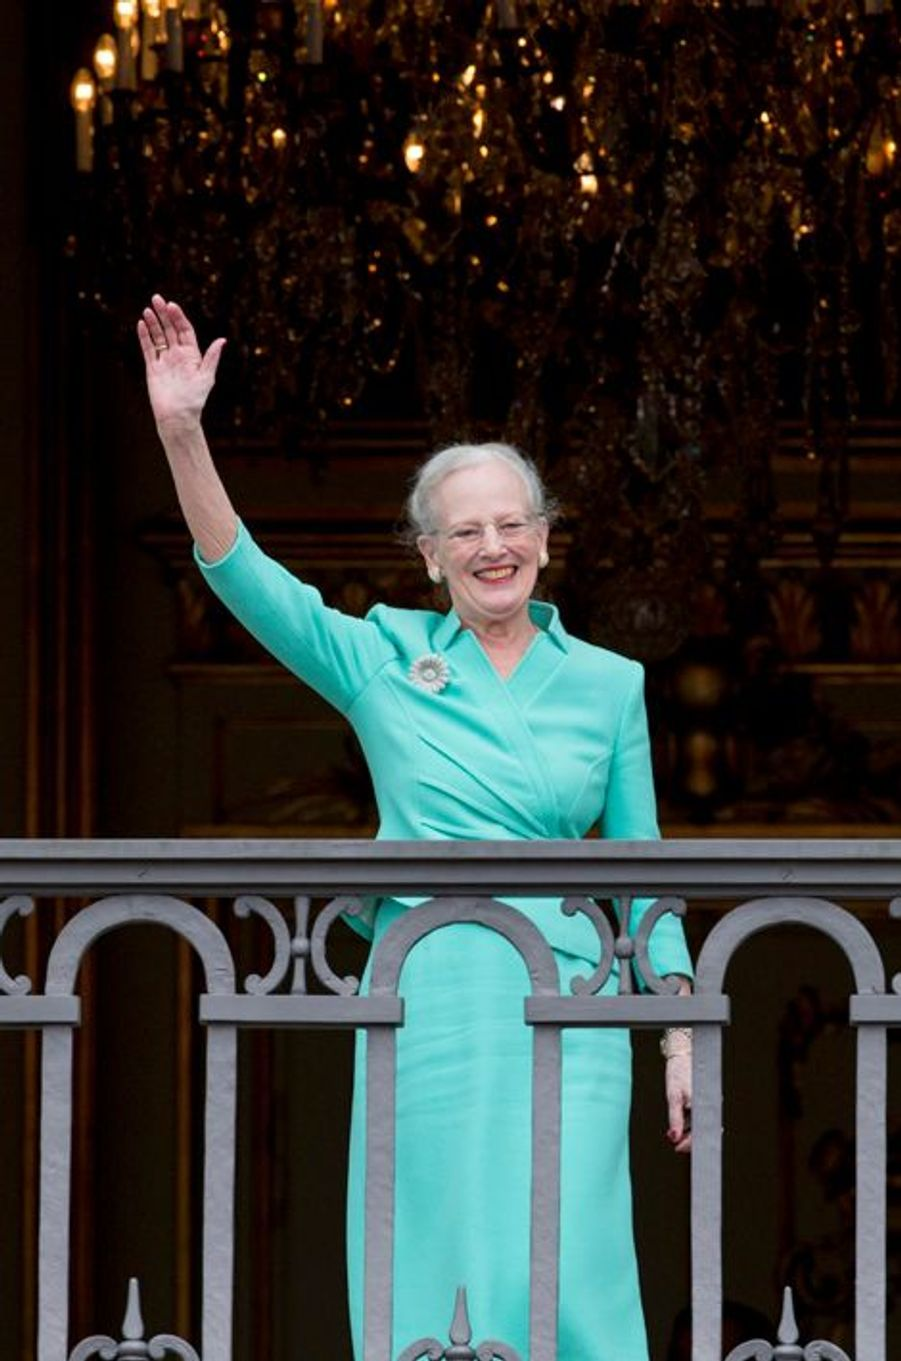 La reine Margrethe II de Danemark, le 16 avril 2015